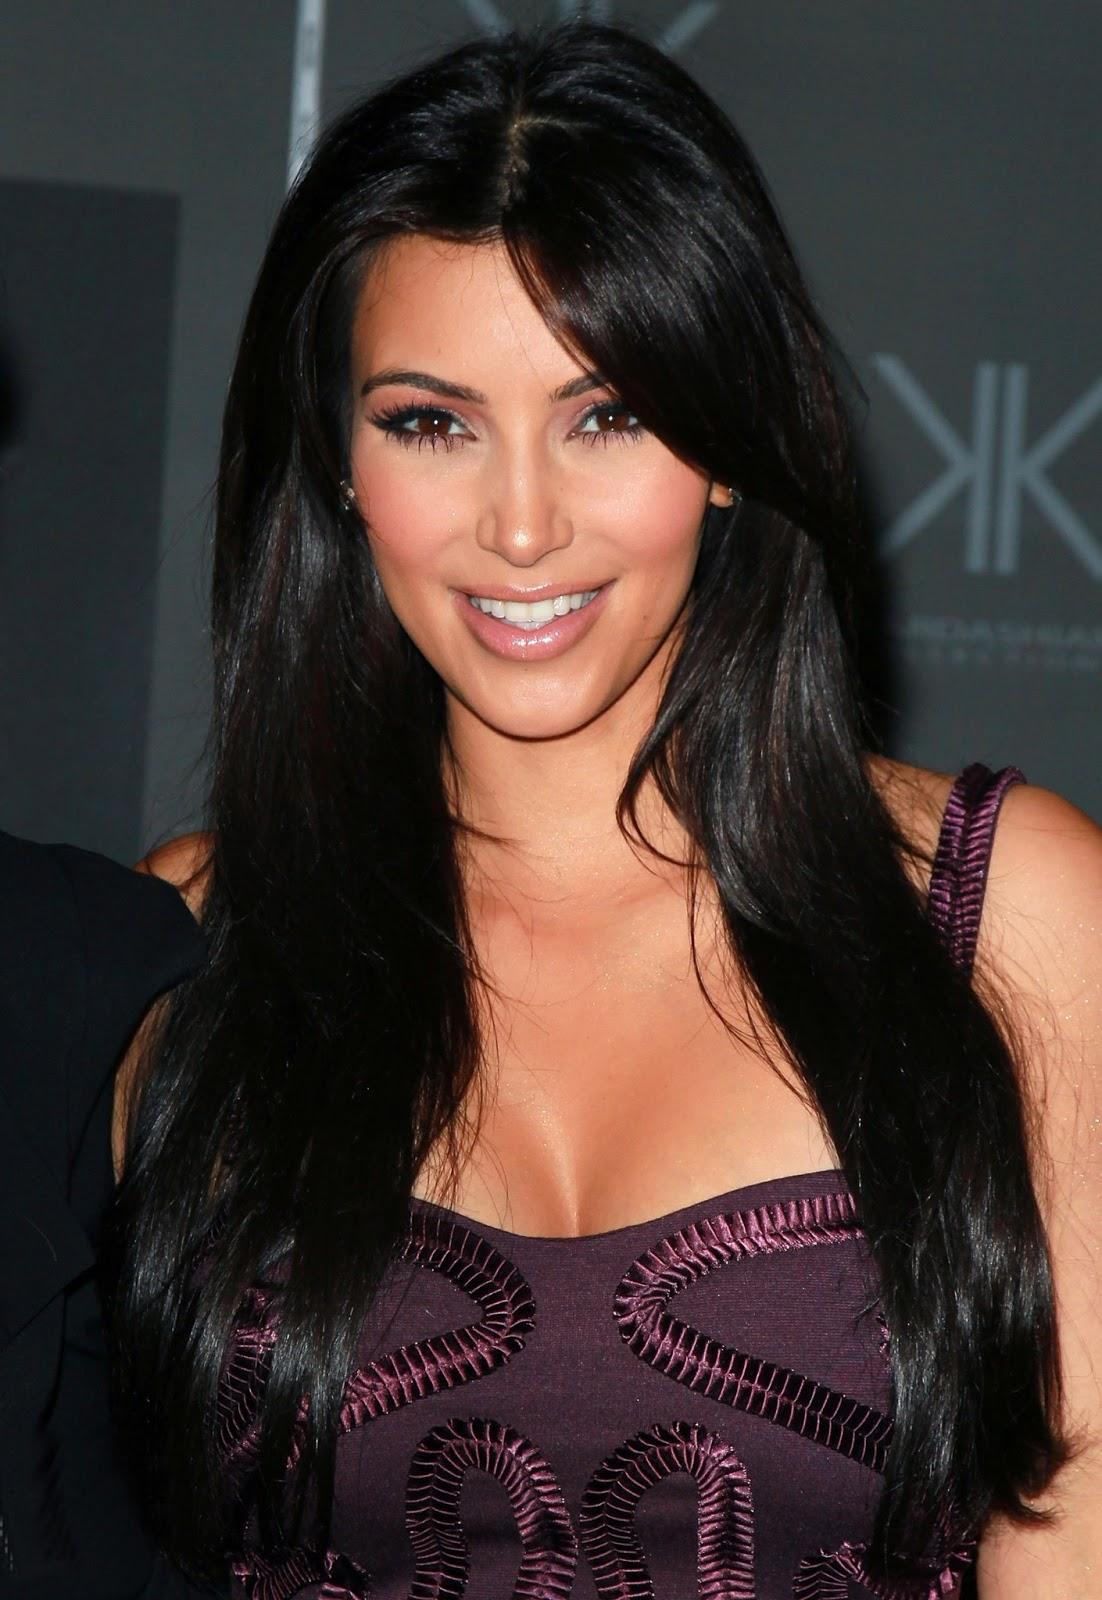 Free Download Hd Wallpapers Kim Kardashian Hd Wallpapers